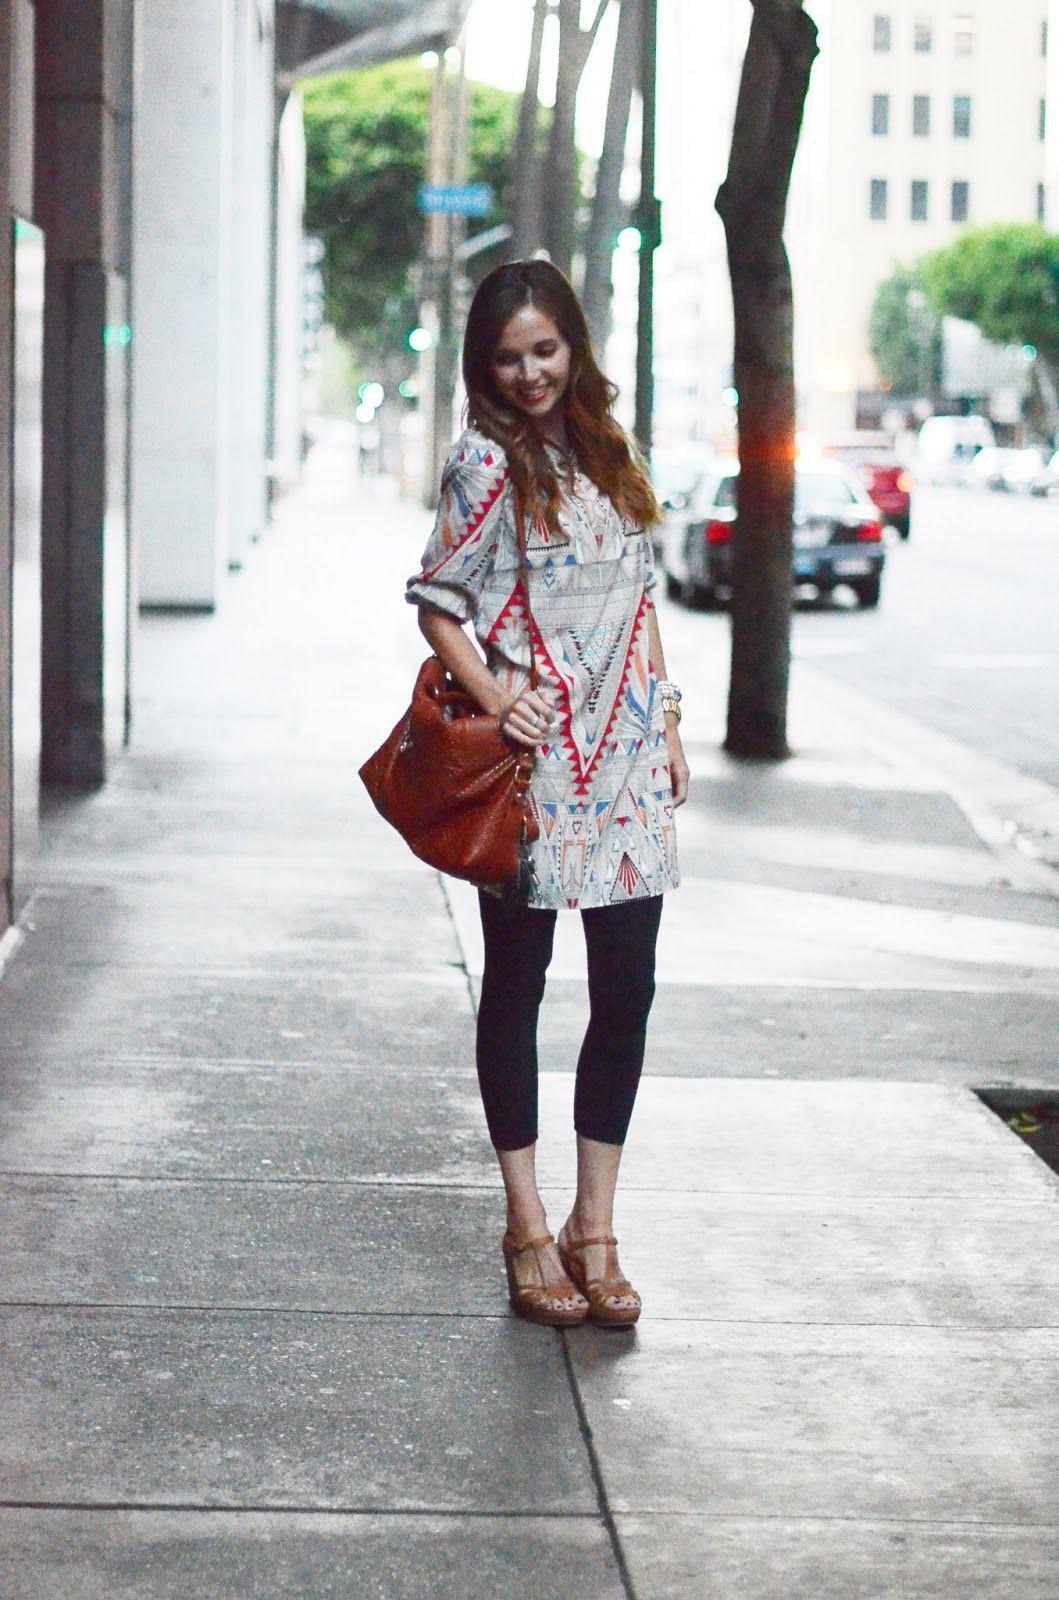 f5a324b6ec54 Cute tunic, capri leggings, brown heeled sandals, slouchy carmel  bag.....have all the items already in my closet.